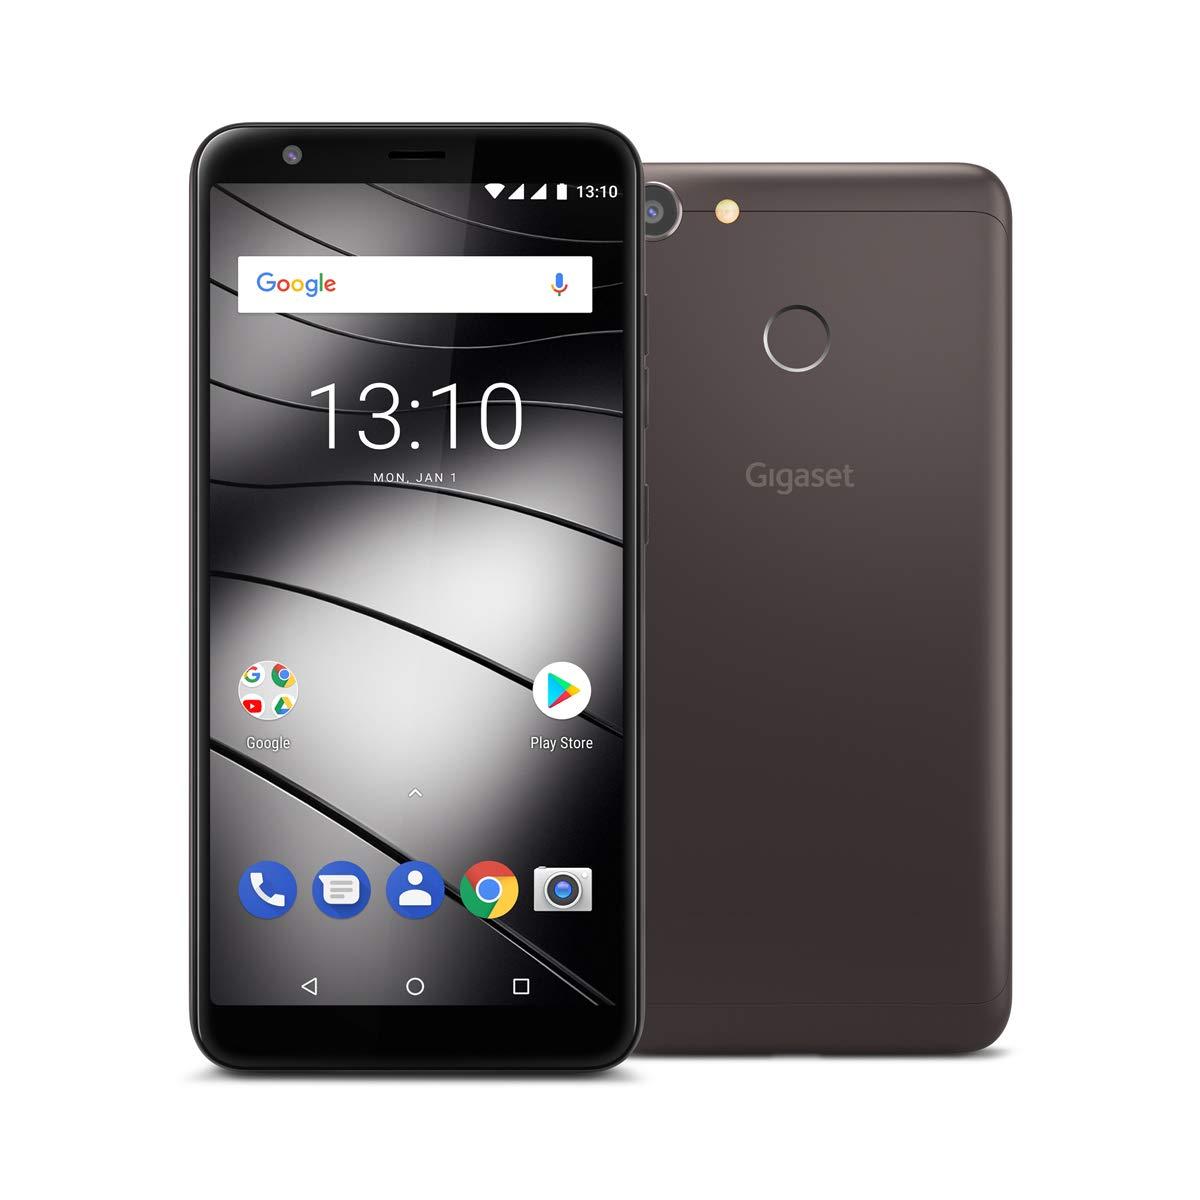 Gigaset GS280 - - Smartphone - Pantalla de 14.5 cm (5.7